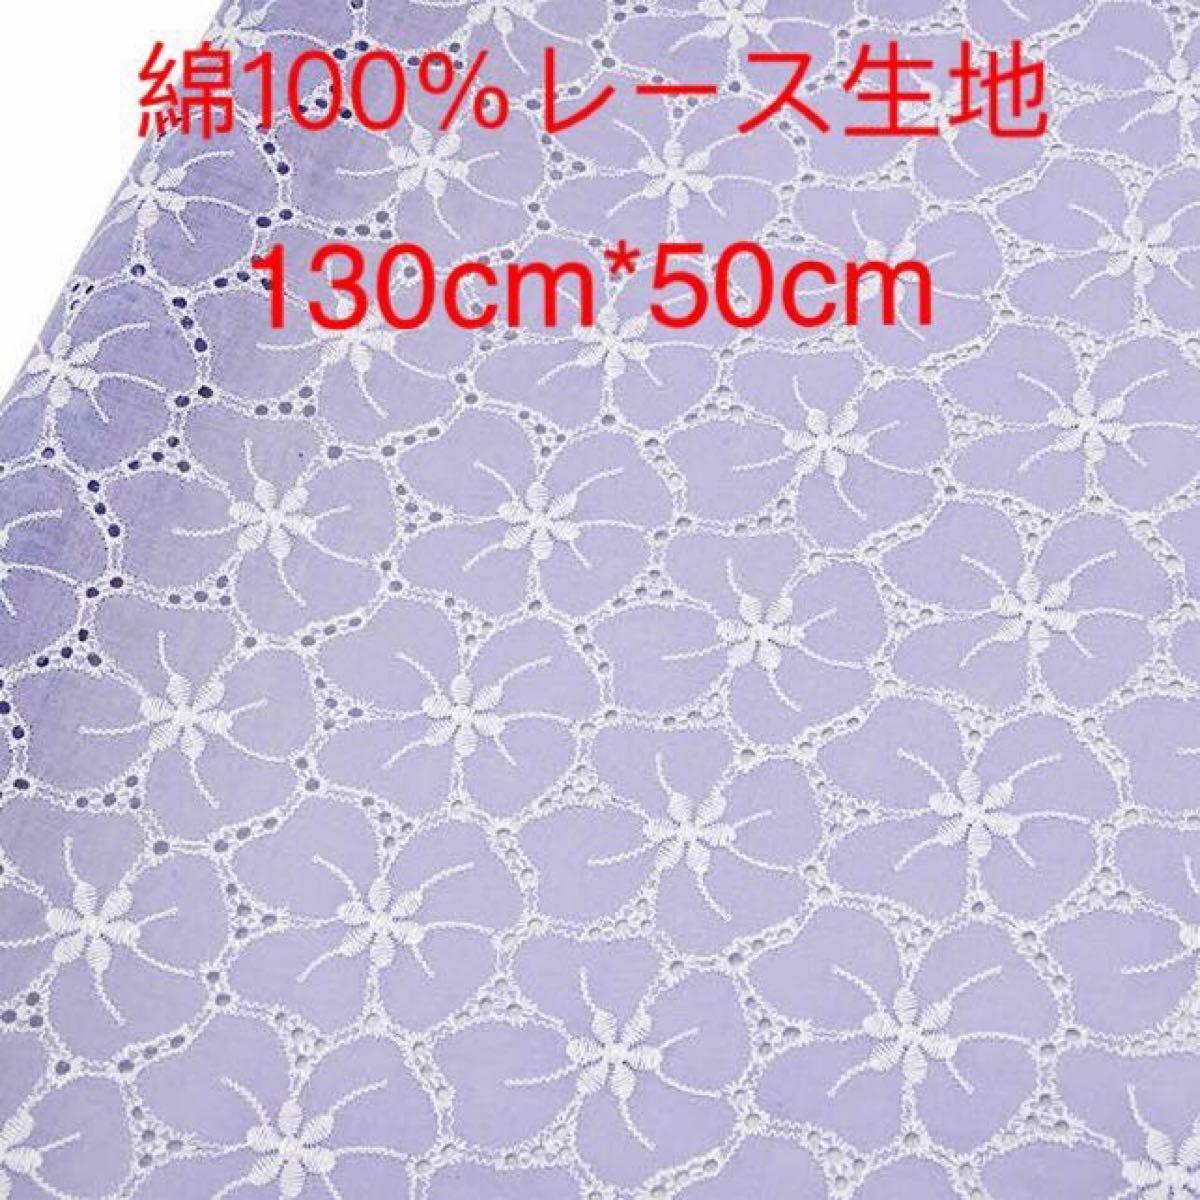 L001 綿100% カット 花柄 刺繍 綿レース生地130cm*50cm